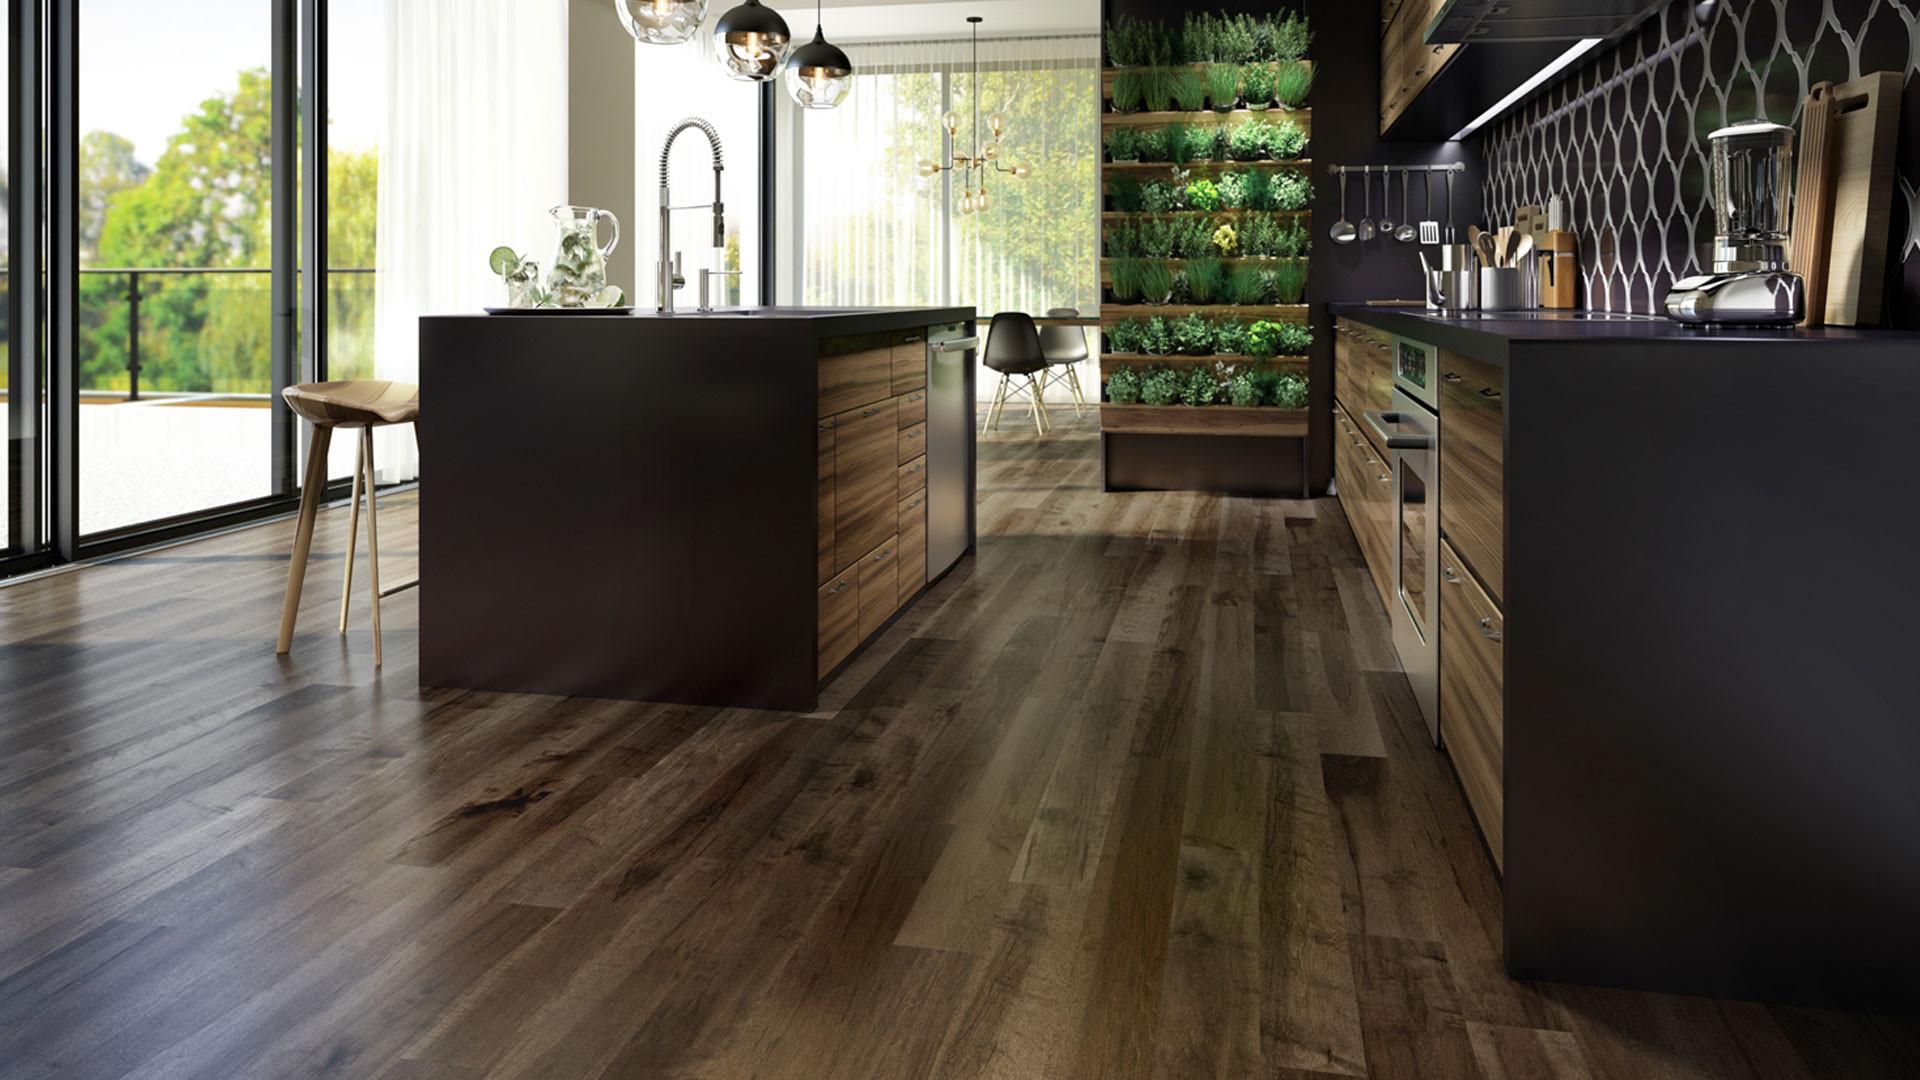 hardwood flooring trends for 2017 of 4 latest hardwood flooring trends lauzon flooring intended for top 4 hardwood flooring trends